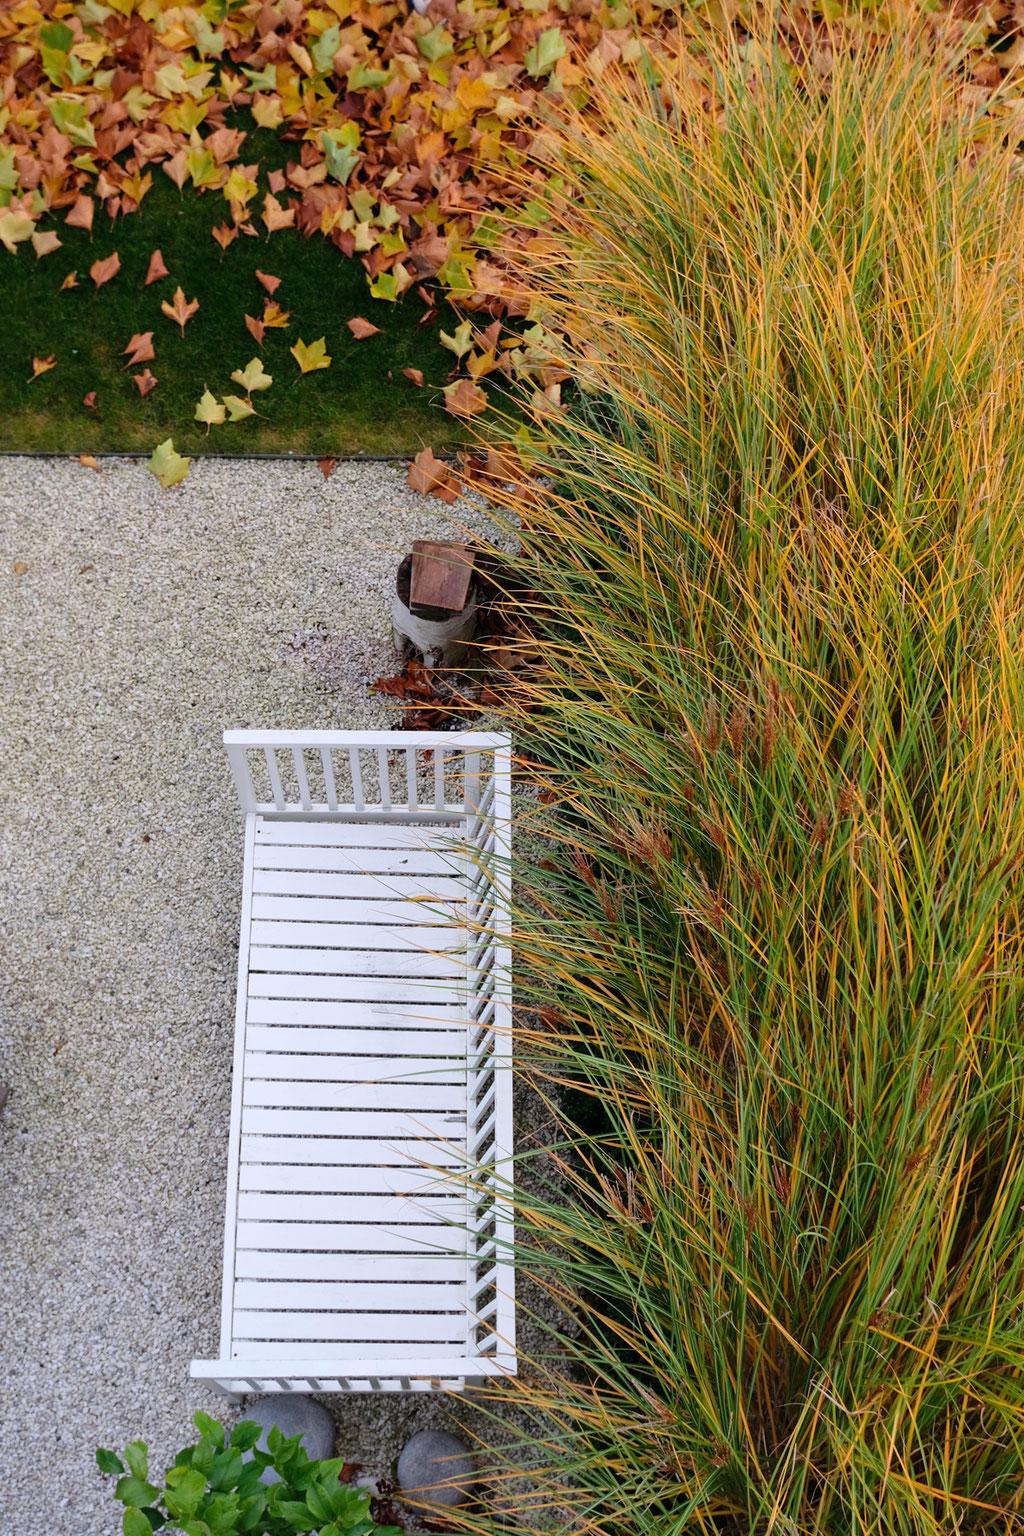 dieartigeGARTEN - Novembergarten | Platanen-Laub, Herbstlaub, goldener Herbst, Blattgold+Gartenbank+Miscanthus